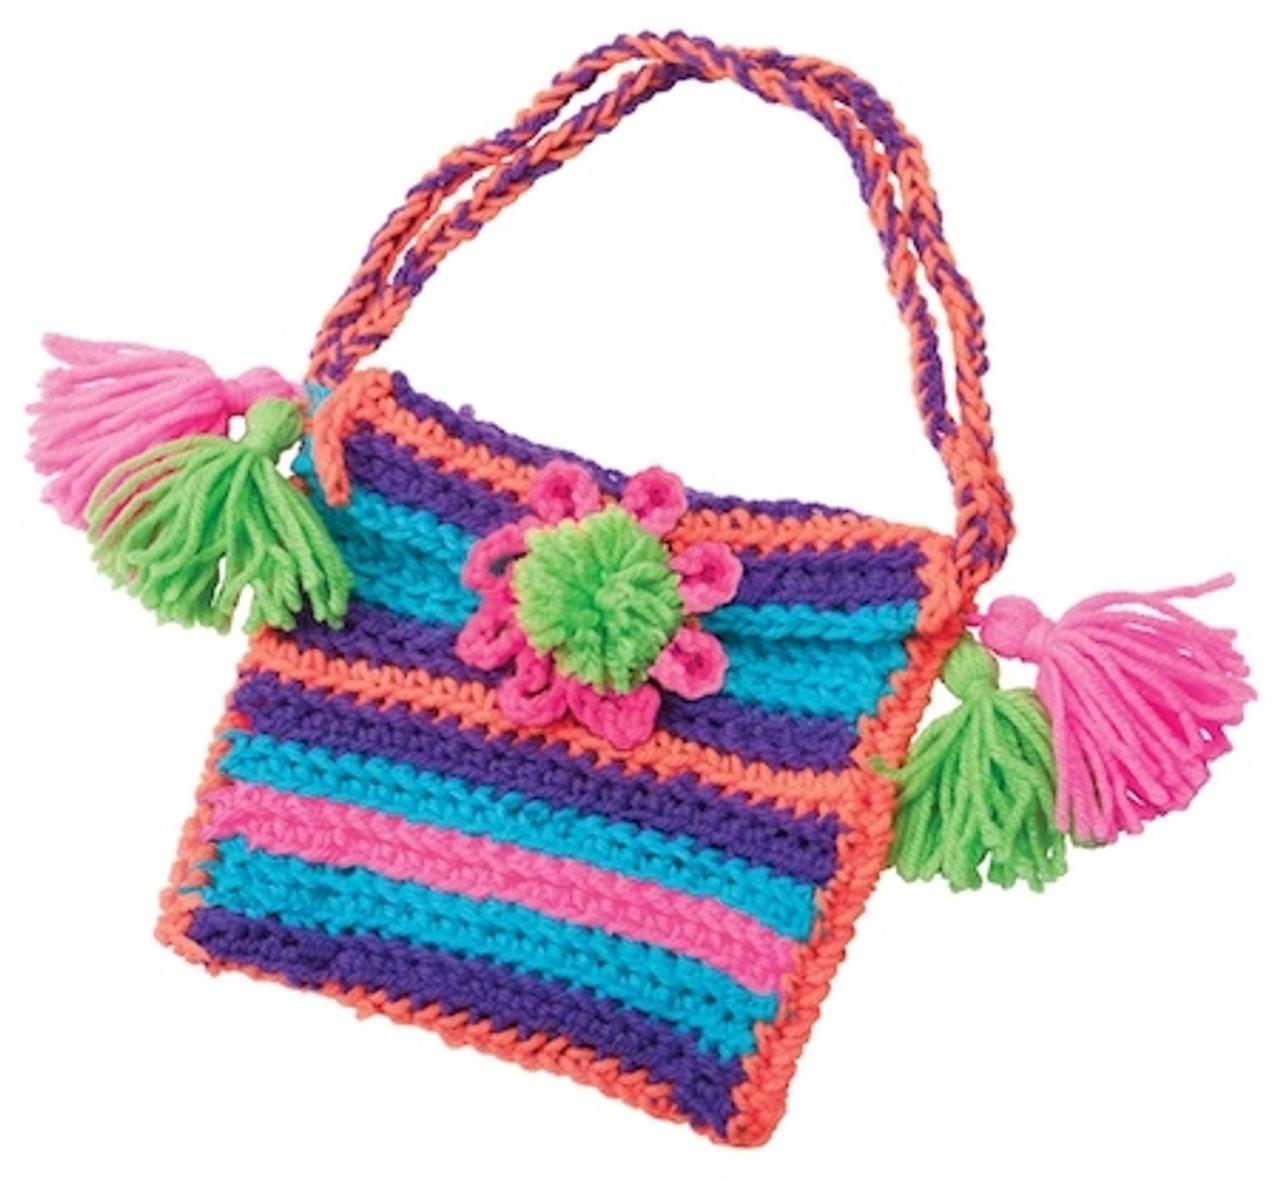 Kid's Stitching & Weaving Crafts